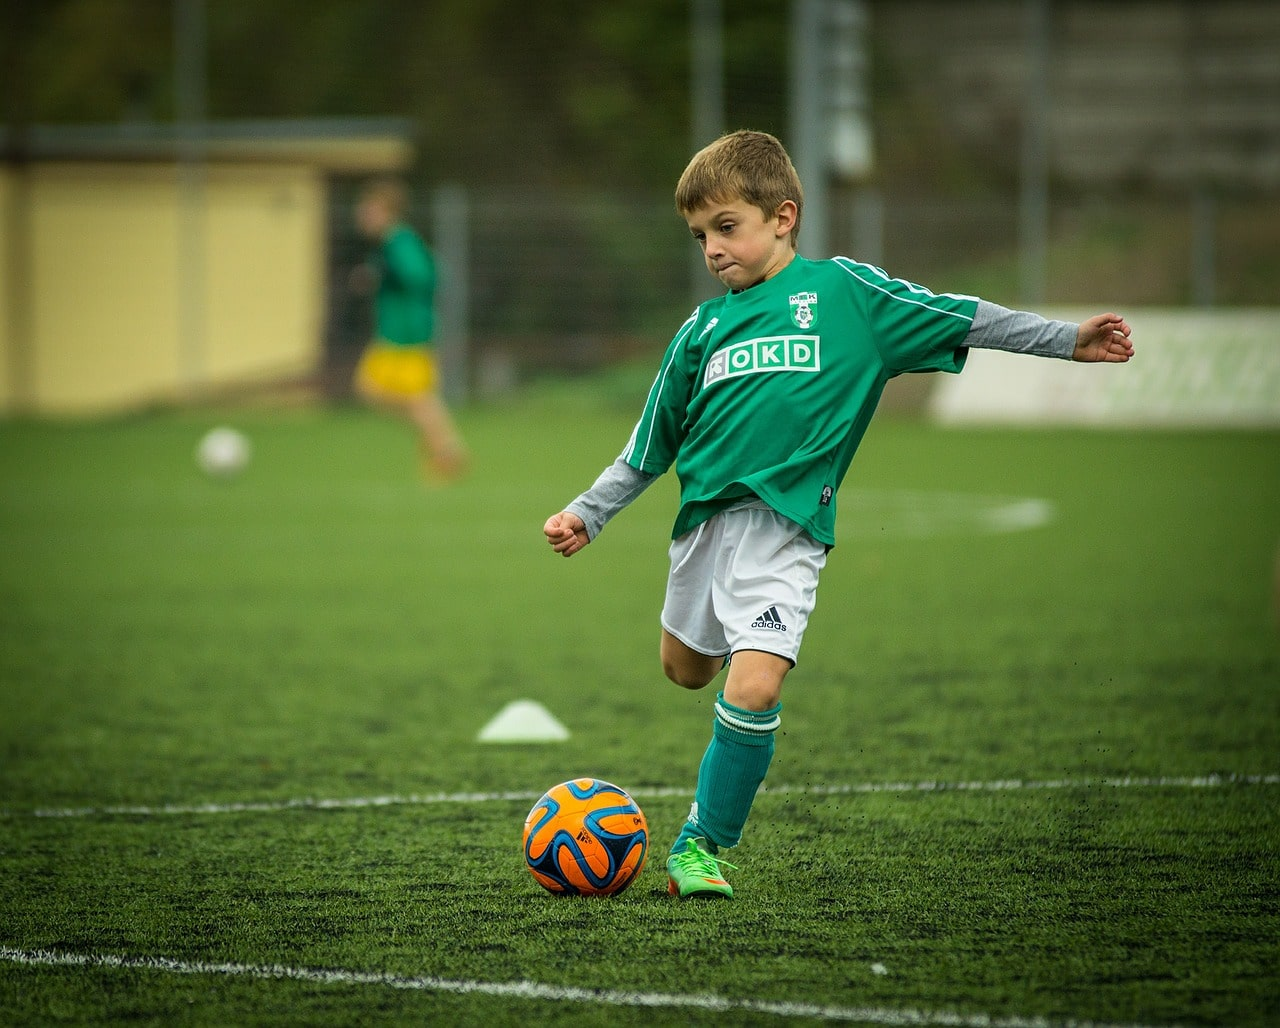 Kid's Sport Injuries Treatment: Carlin Chiropractic